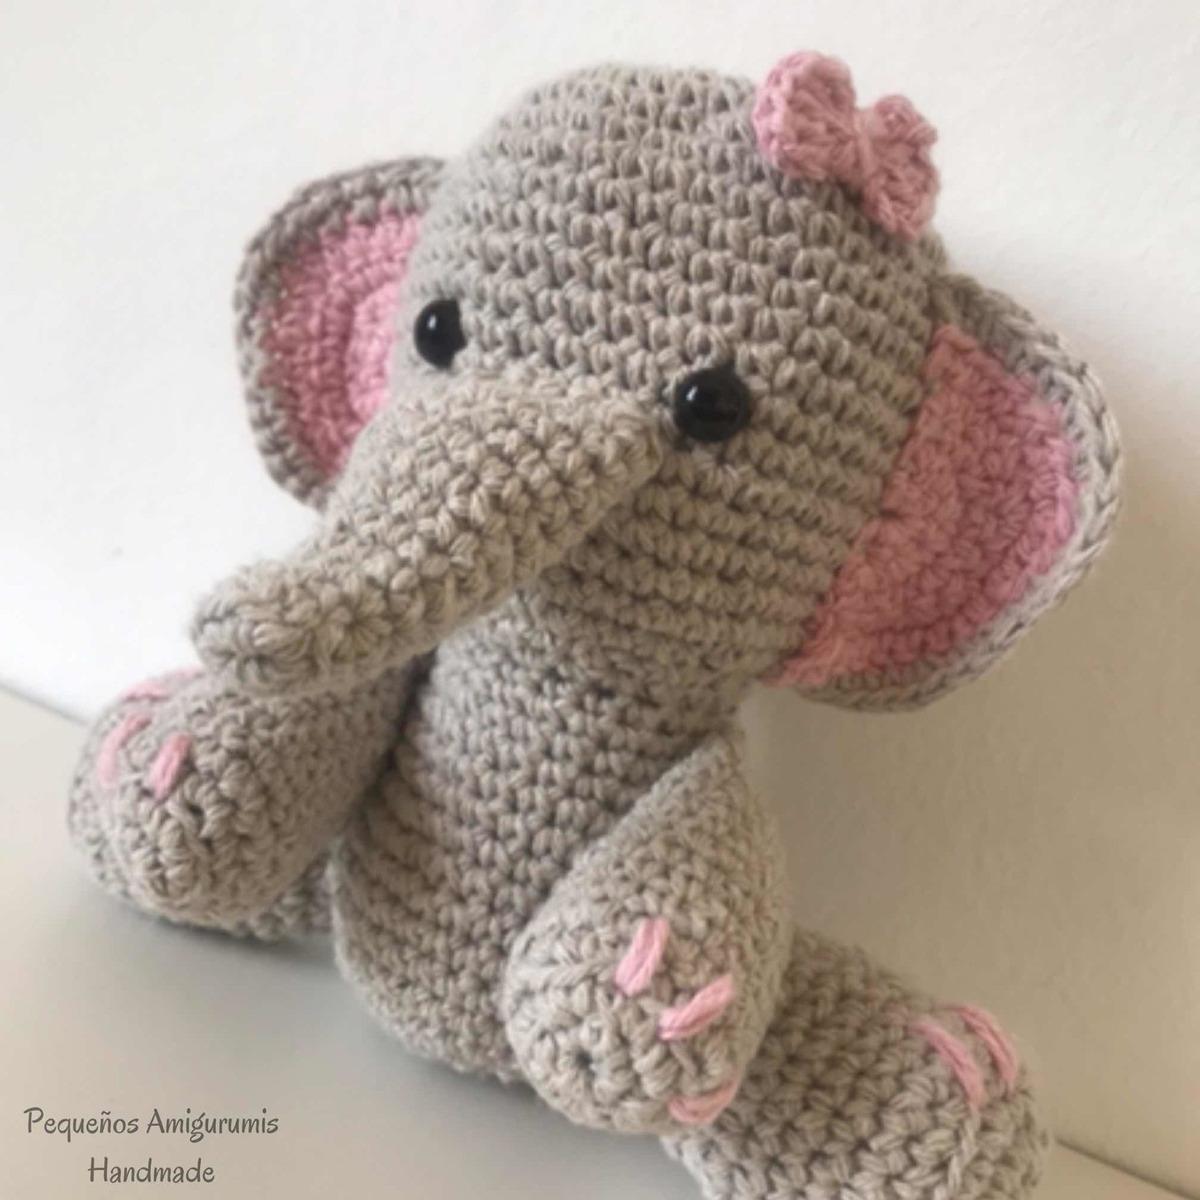 Amigurumi Crochet Crocheted AMIGURUMI Elephant [Trompa de elefante ... | 1200x1200